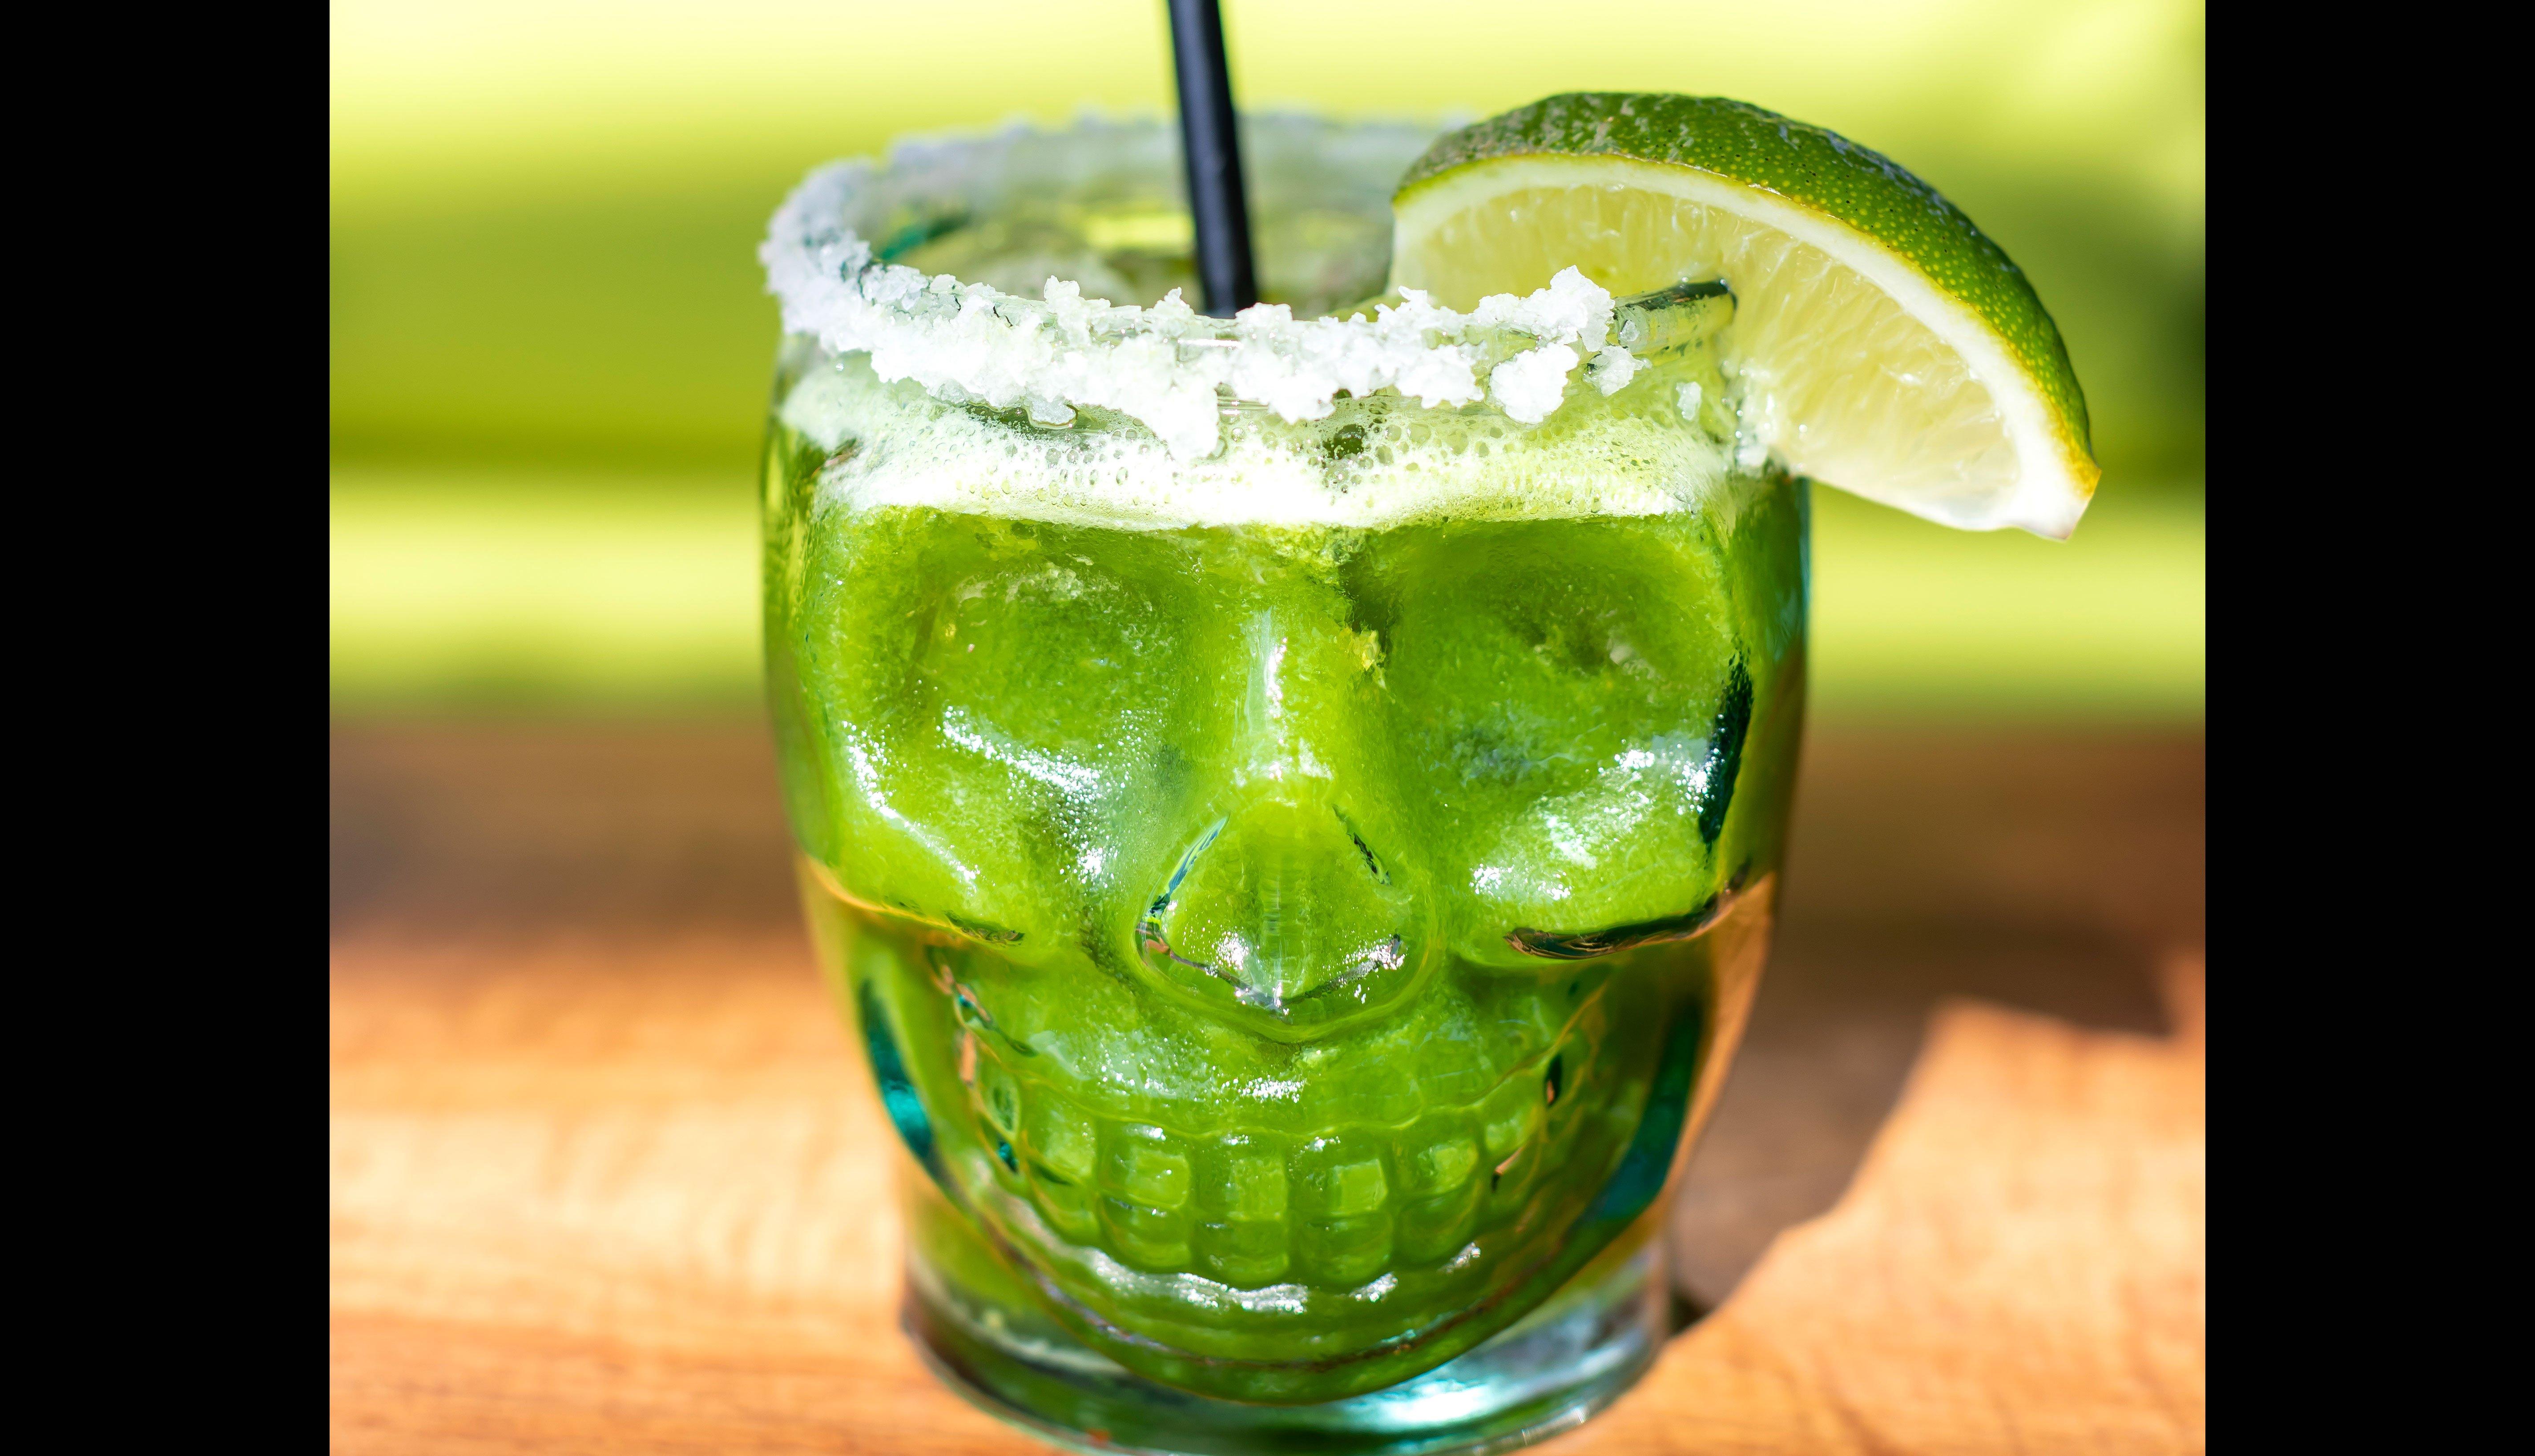 Margarita verde